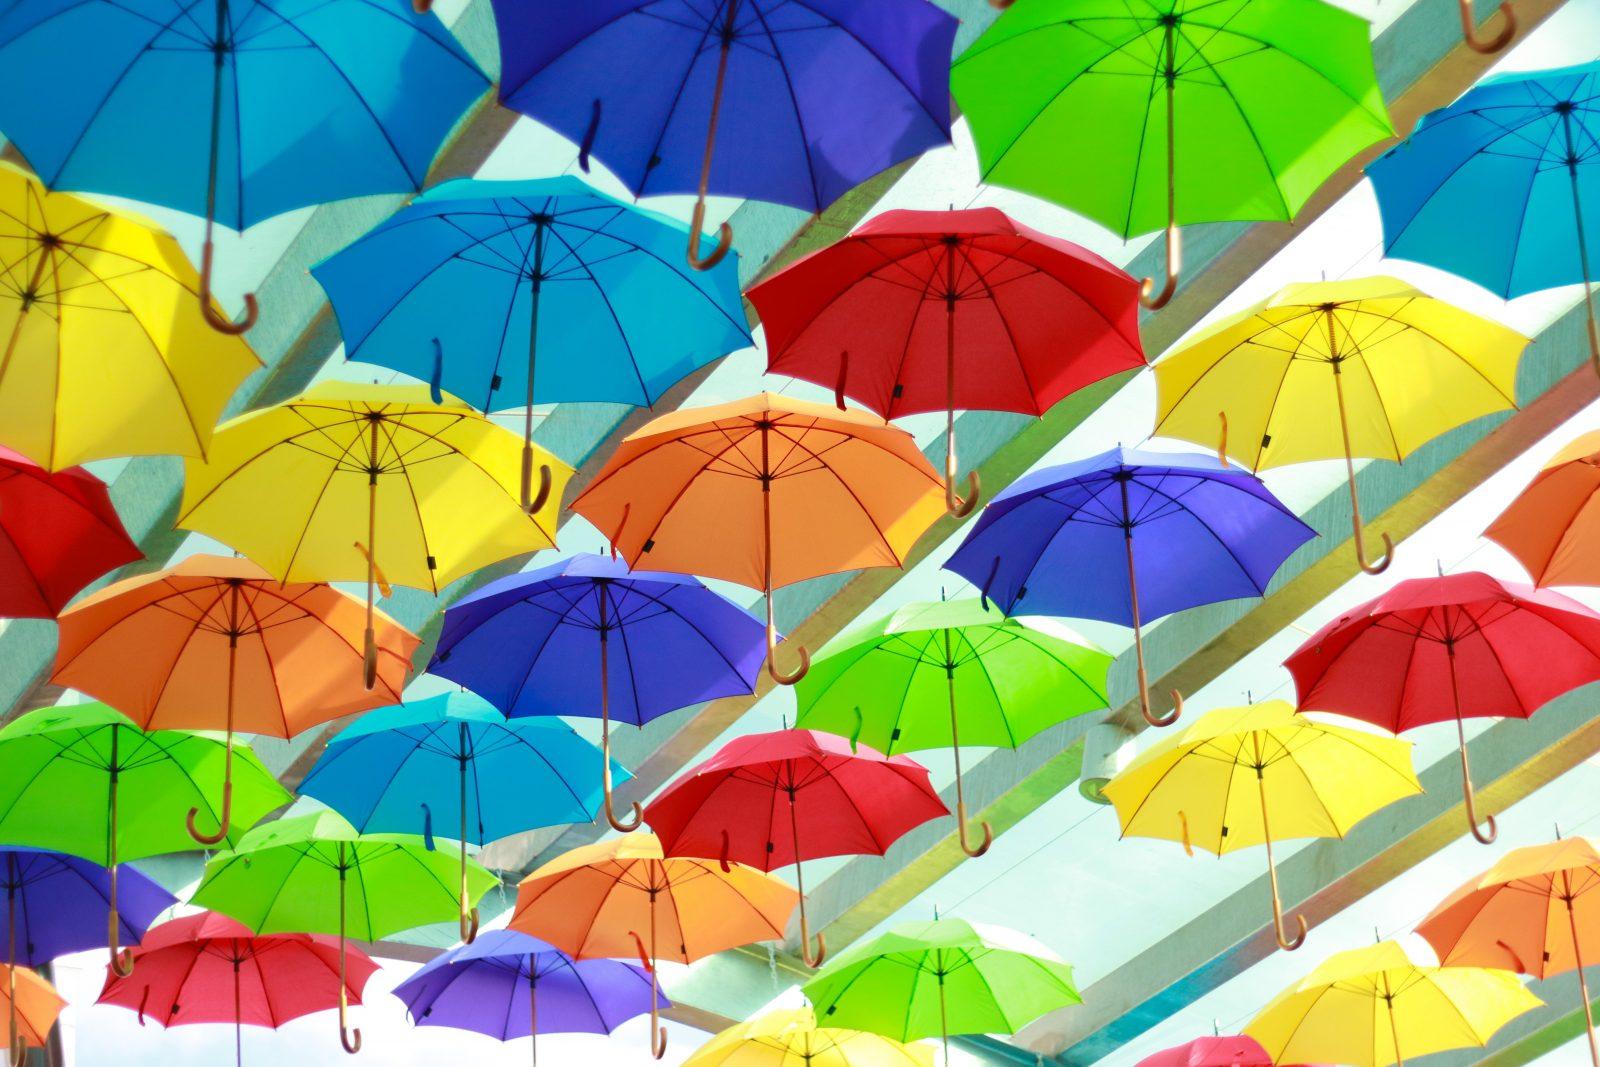 Bridge Mall Umbrella Canopy